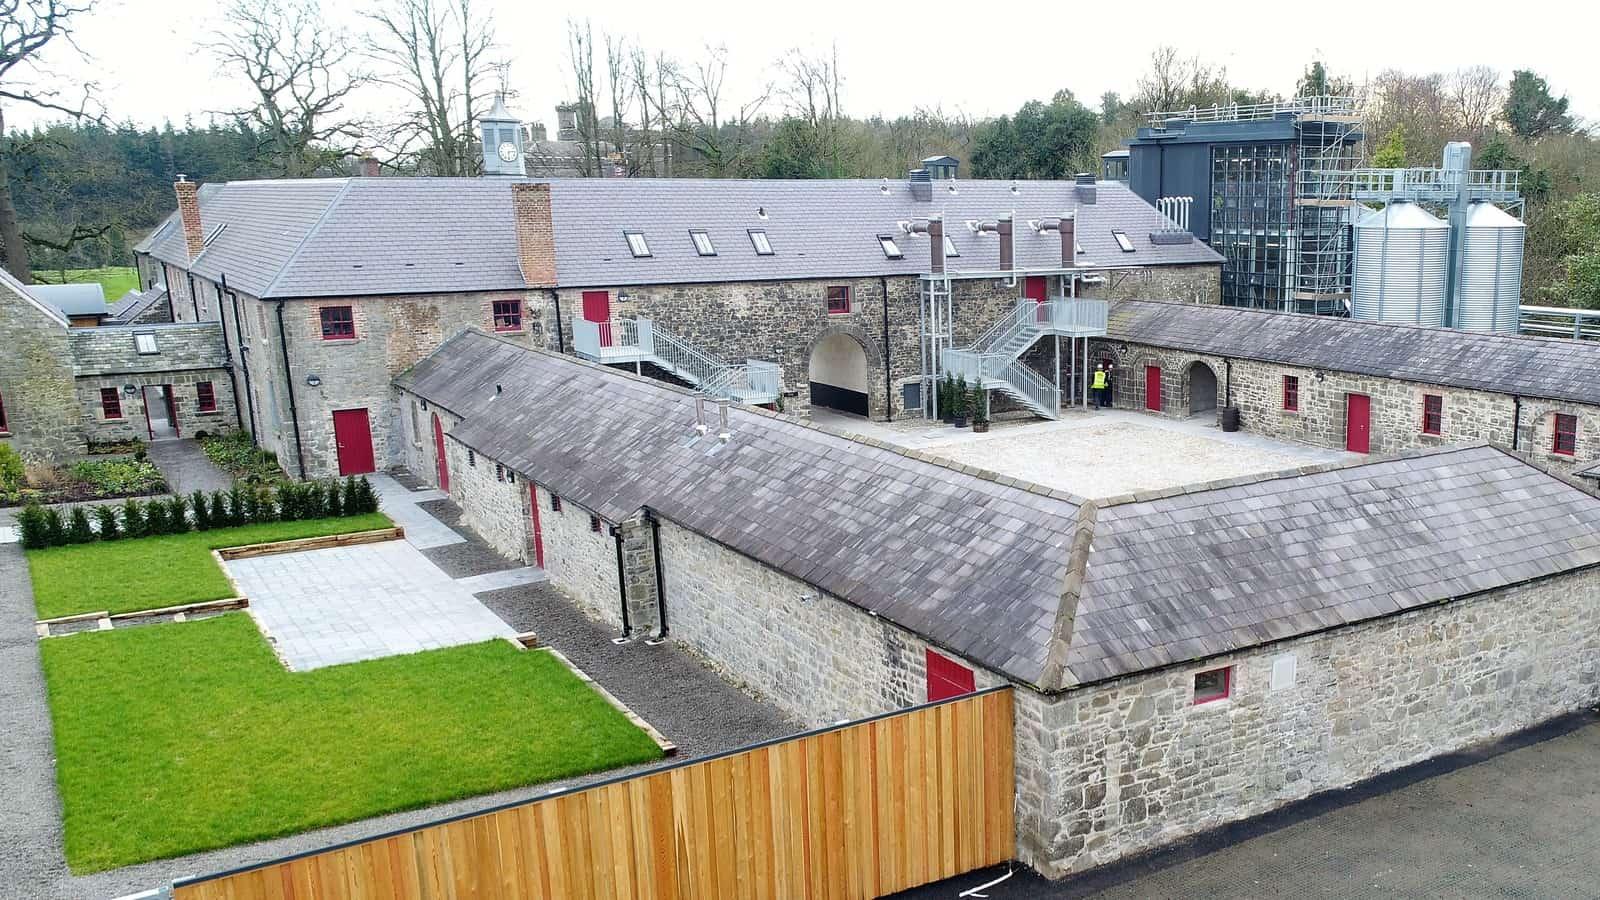 Slane Distillery & Visitor Centre